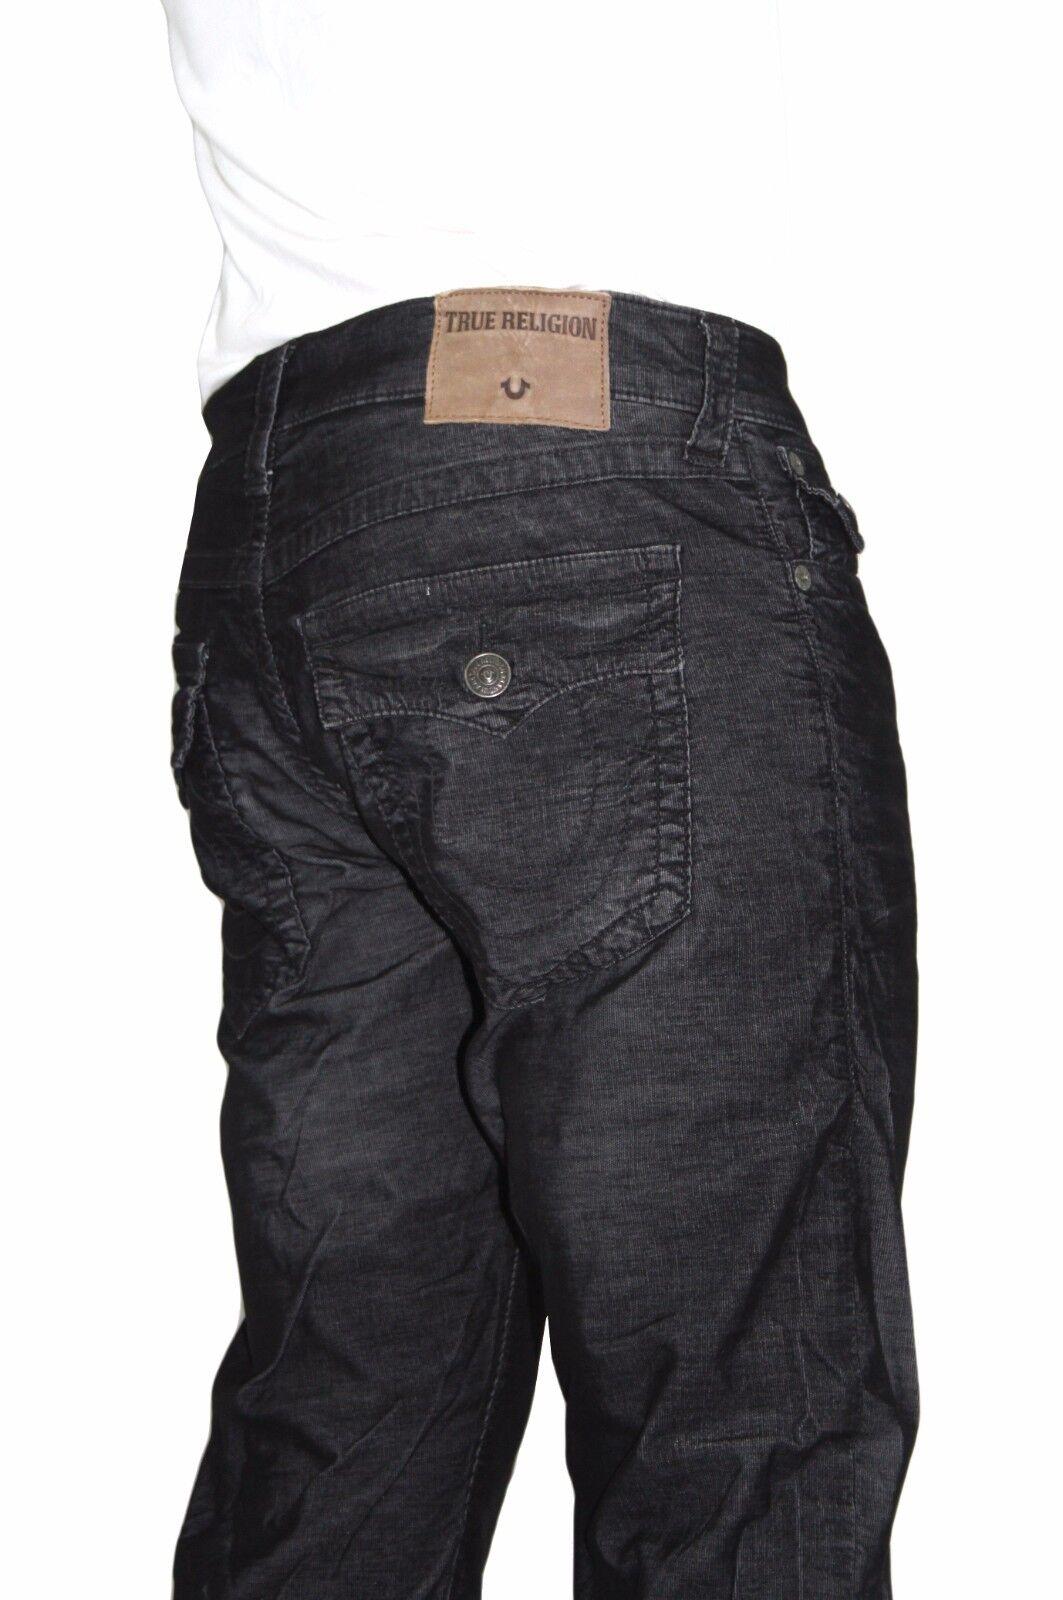 NWT True Religion Brand Men's Ricky Straight Leg Corduroy Black Jeans Pants